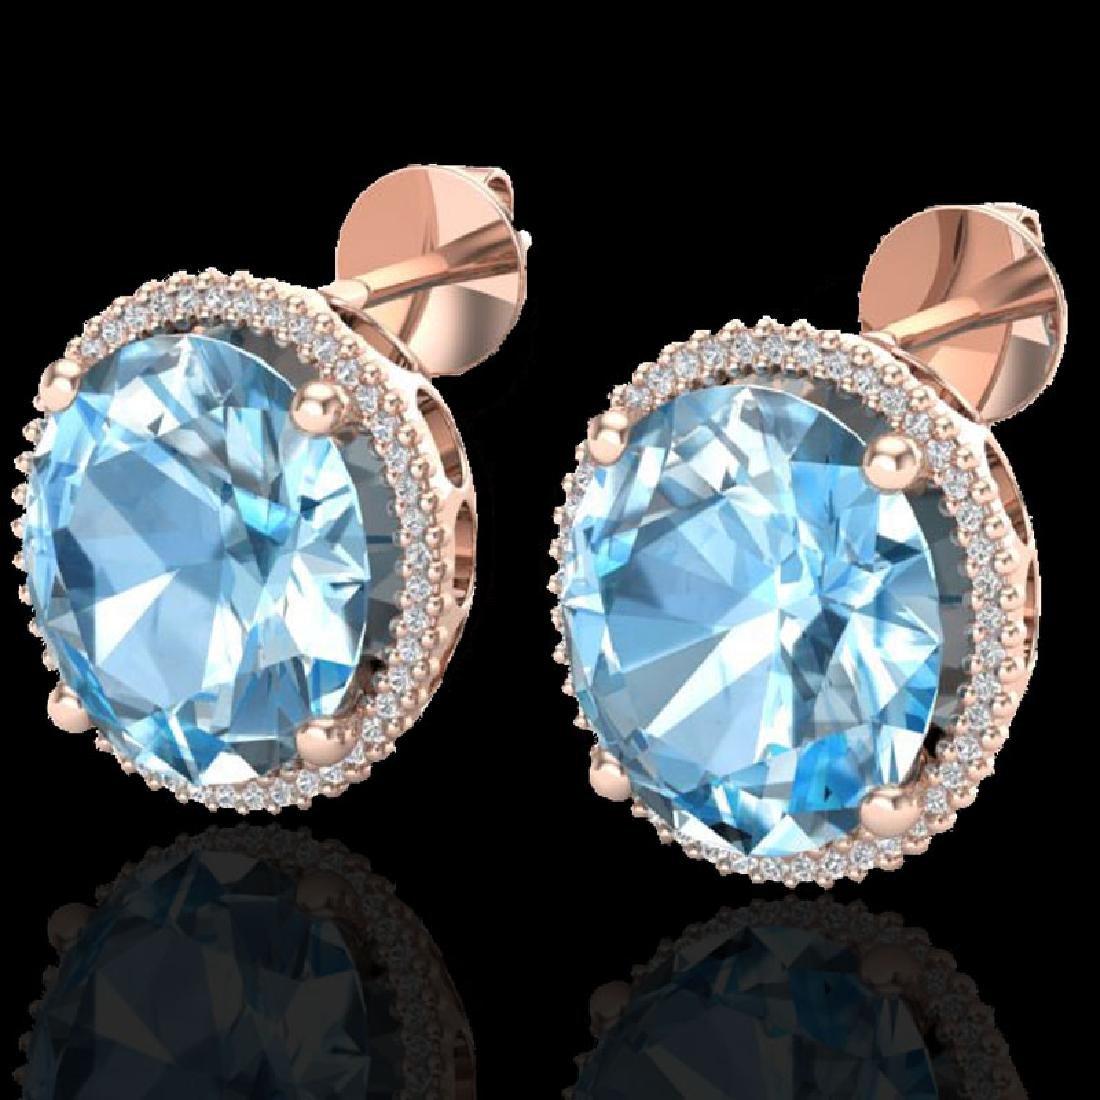 25 CTW Sky Blue Topaz & Micro VS/SI Diamond Halo